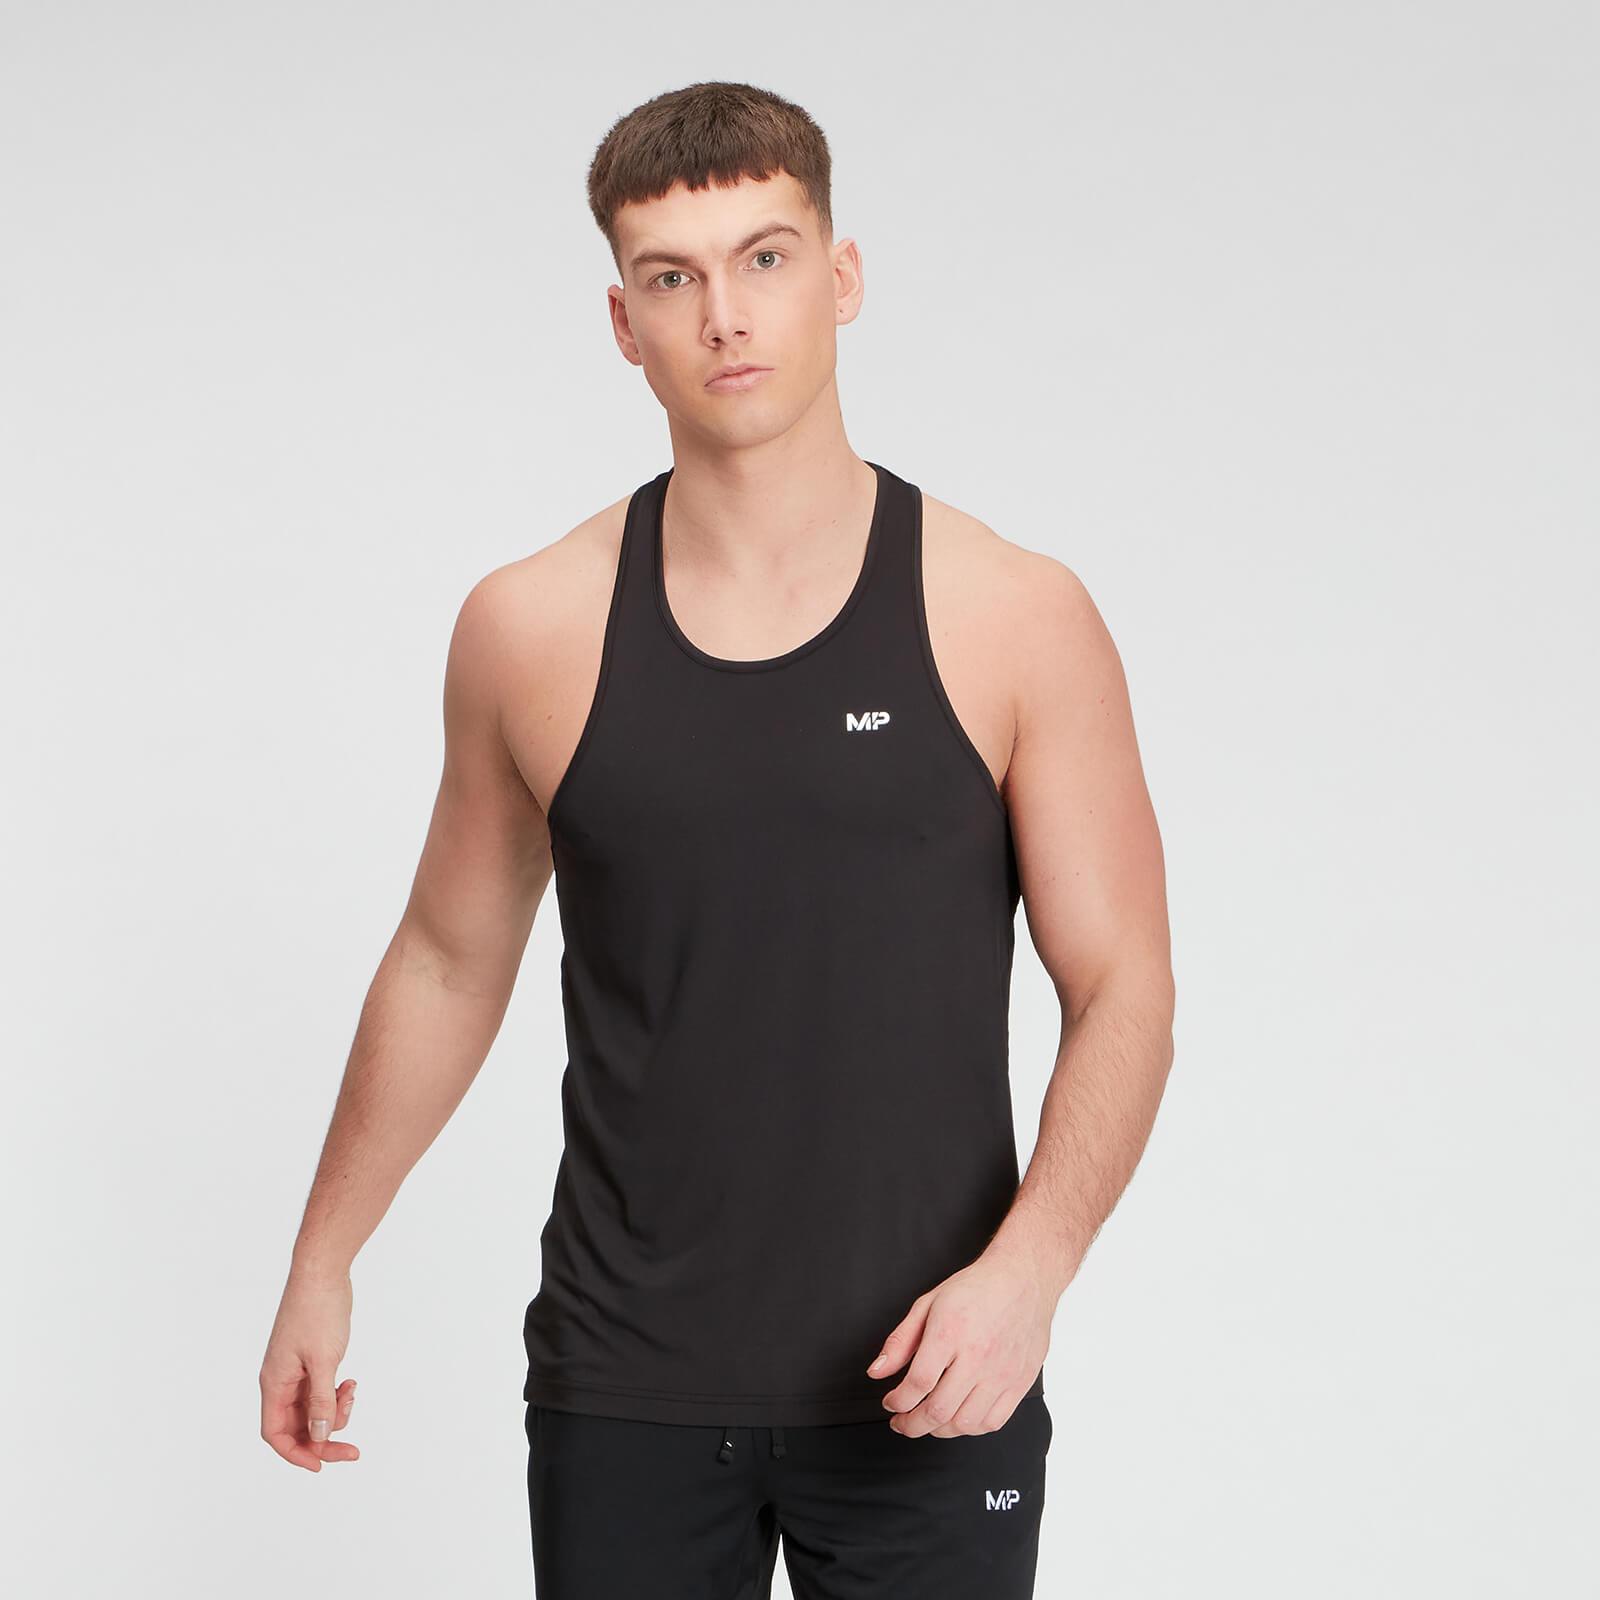 MP Men's Essentials Training Stringer Vest - Black - L